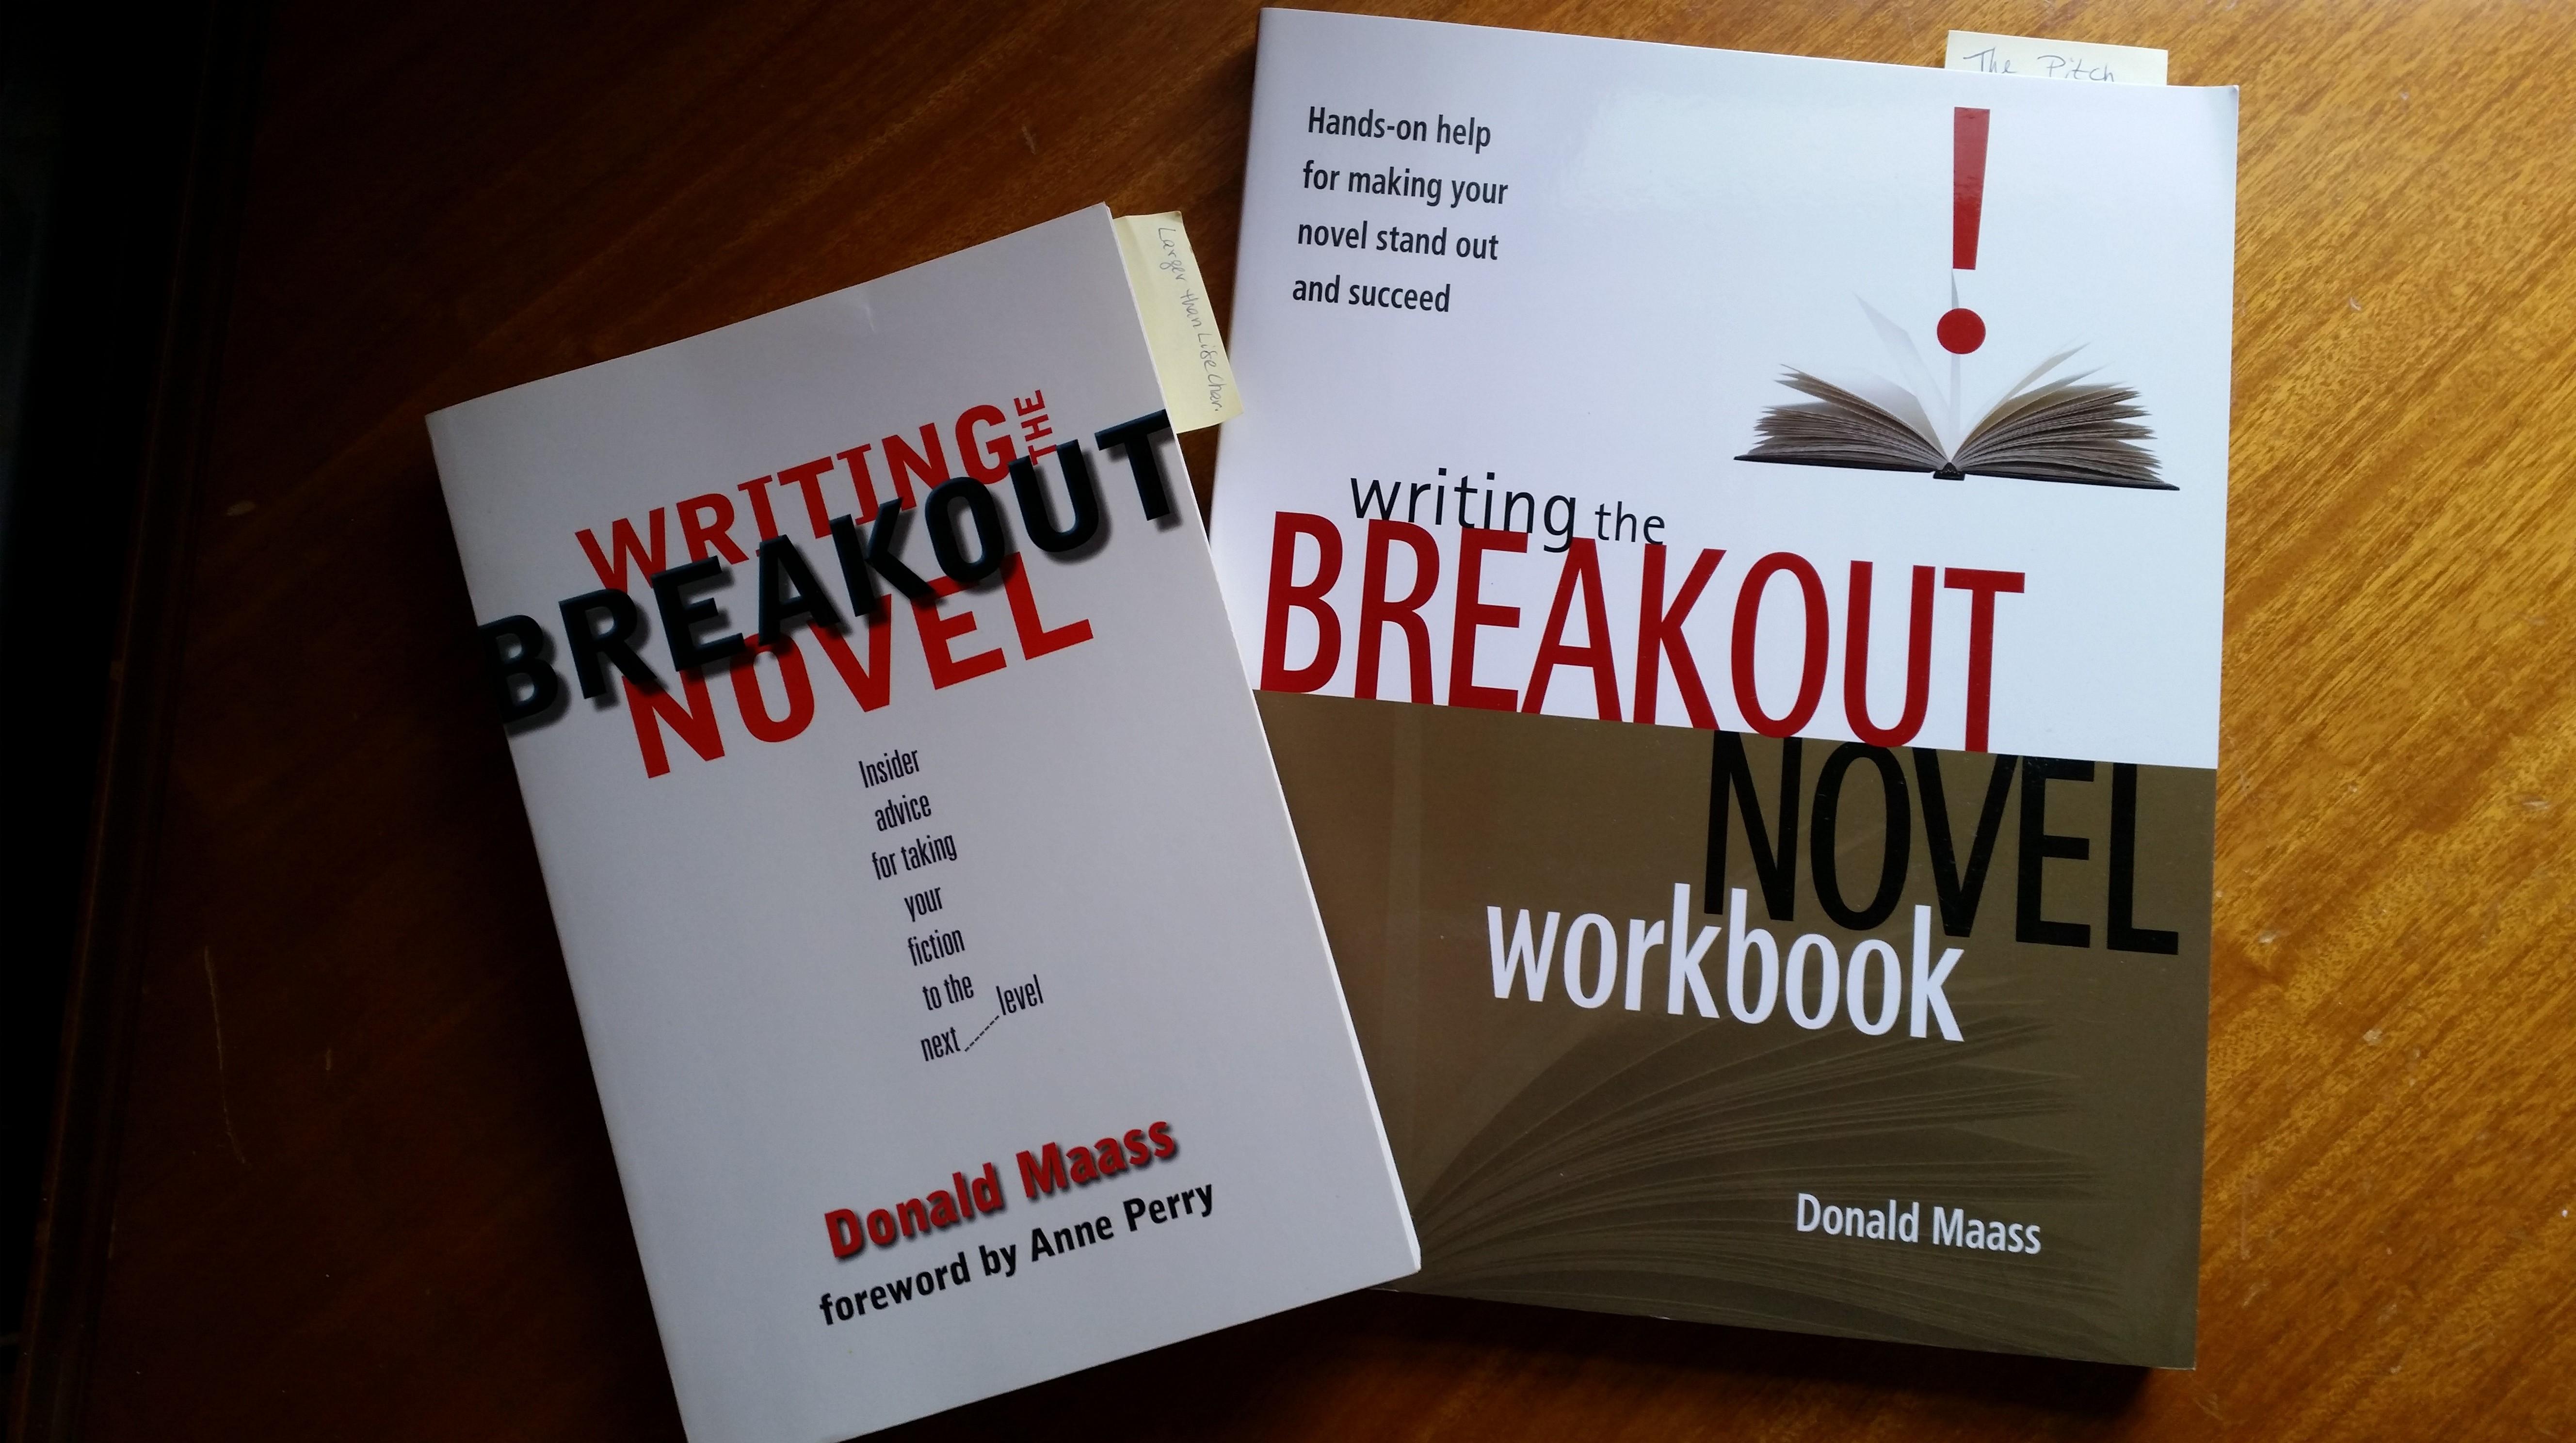 Writing the Breakout Novel ...